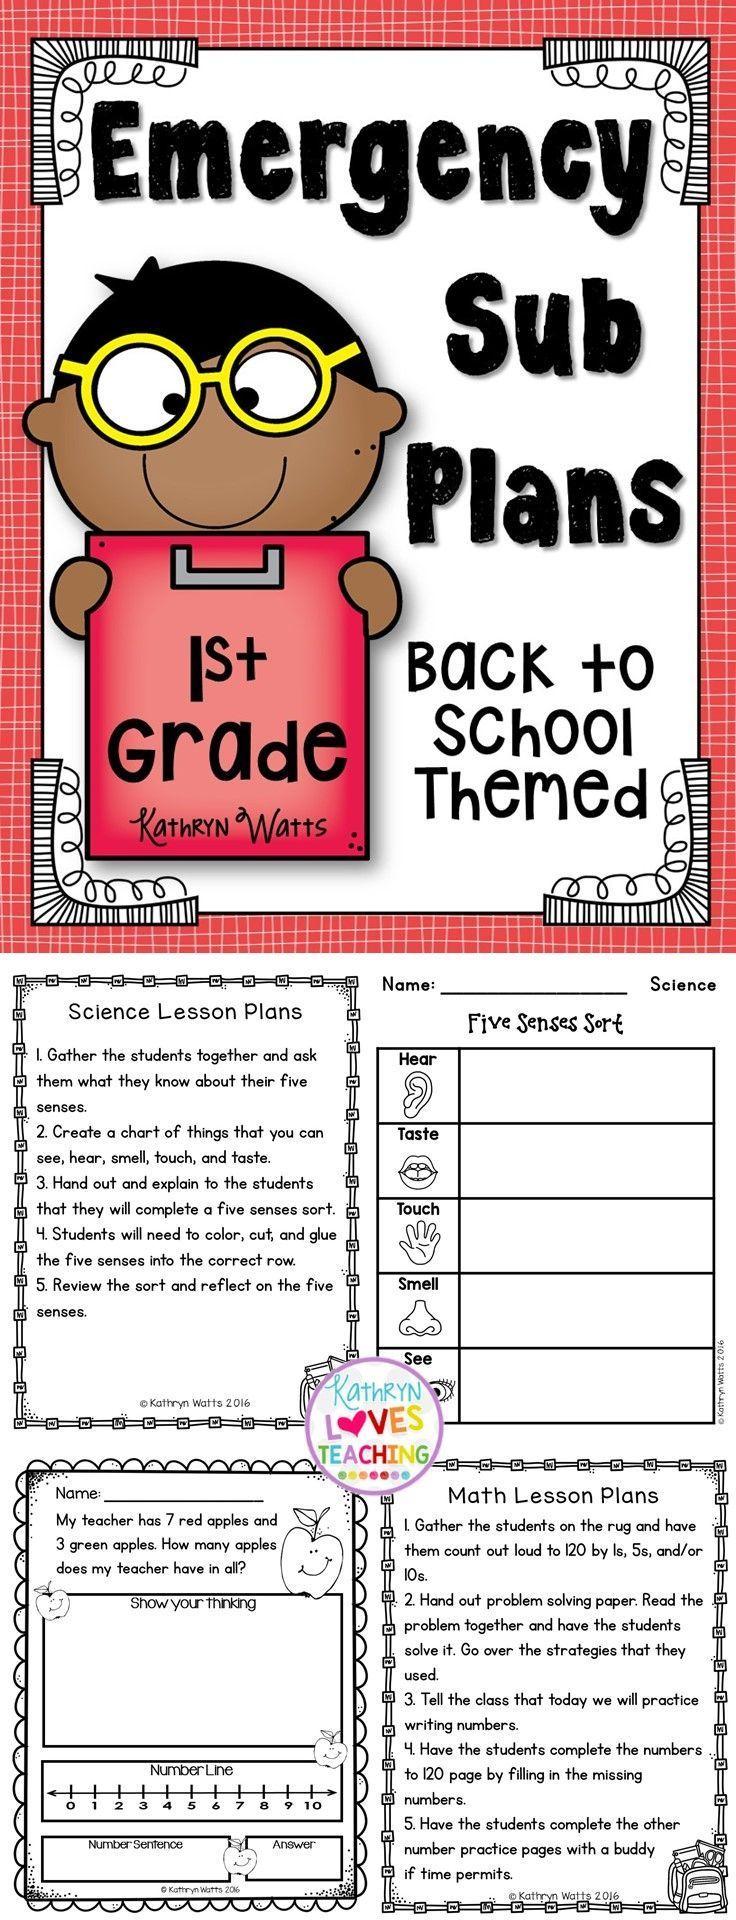 1st grade Emergency Lesson Plans! Middle school lesson